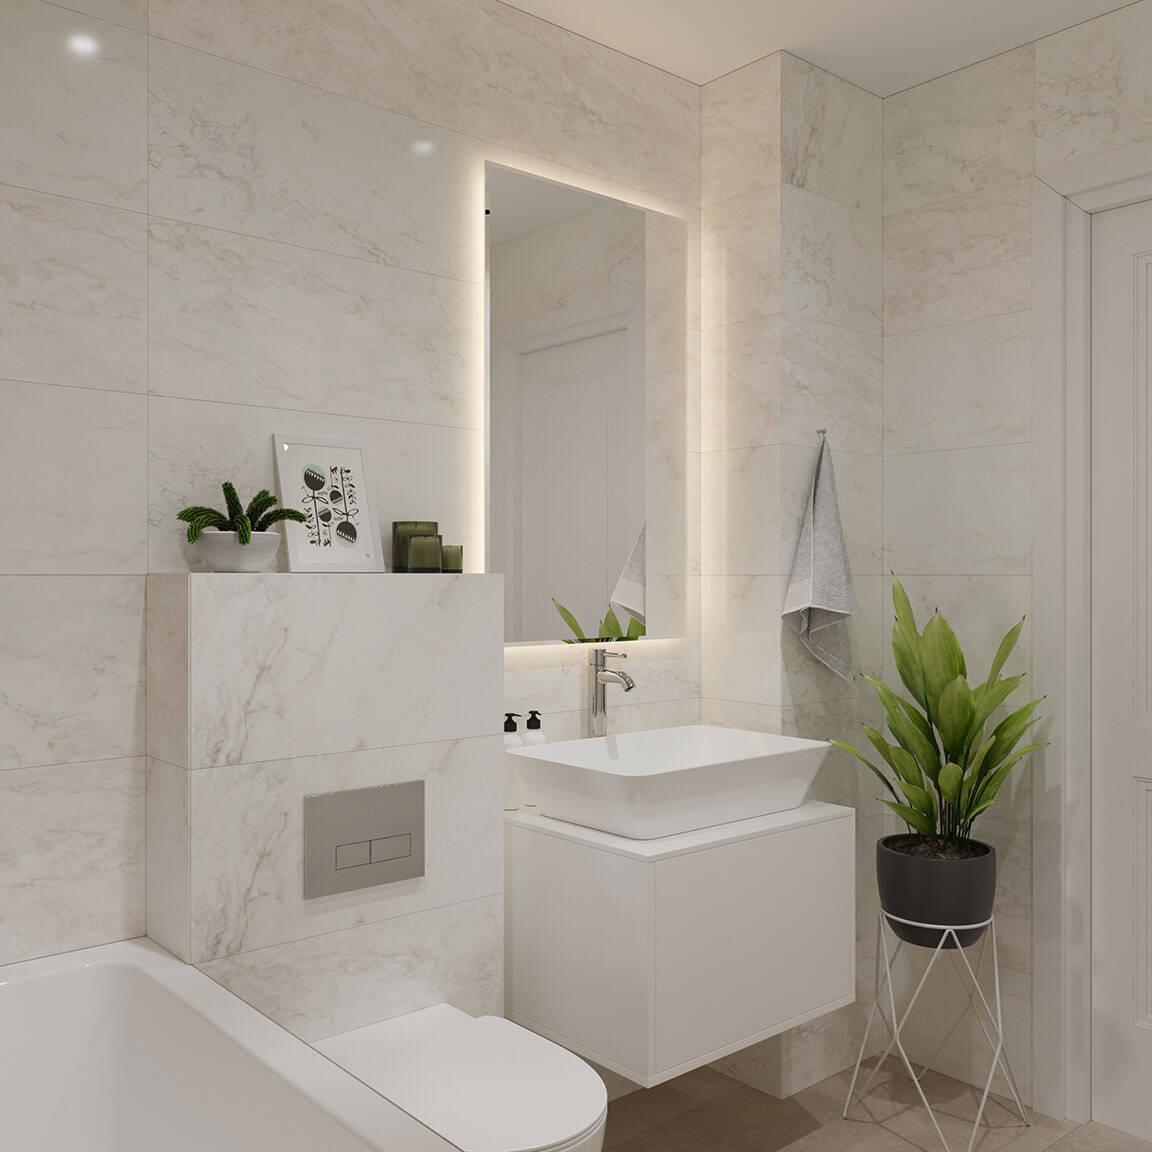 Catedral Residence - Bathroom - Marazzi Ceramic tiles - 14